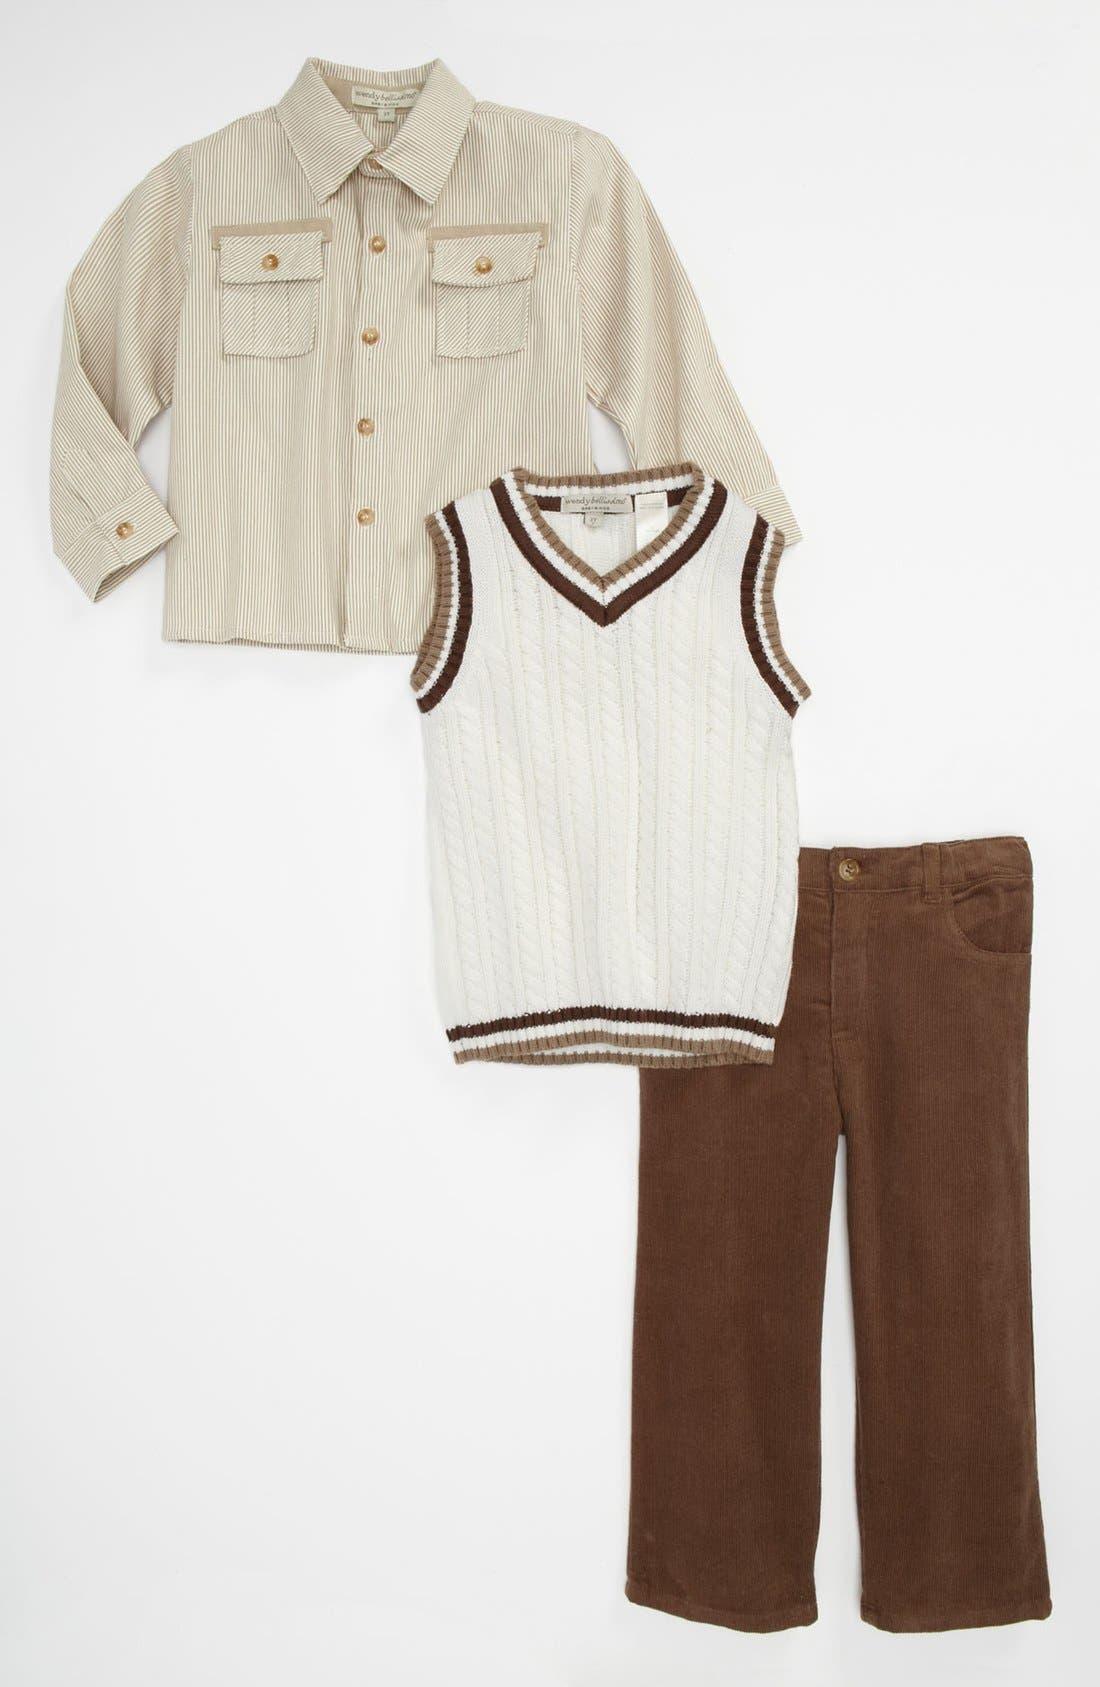 Alternate Image 1 Selected - Wendy Bellisimo Sweater Vest, Shirt & Pants (Toddler)